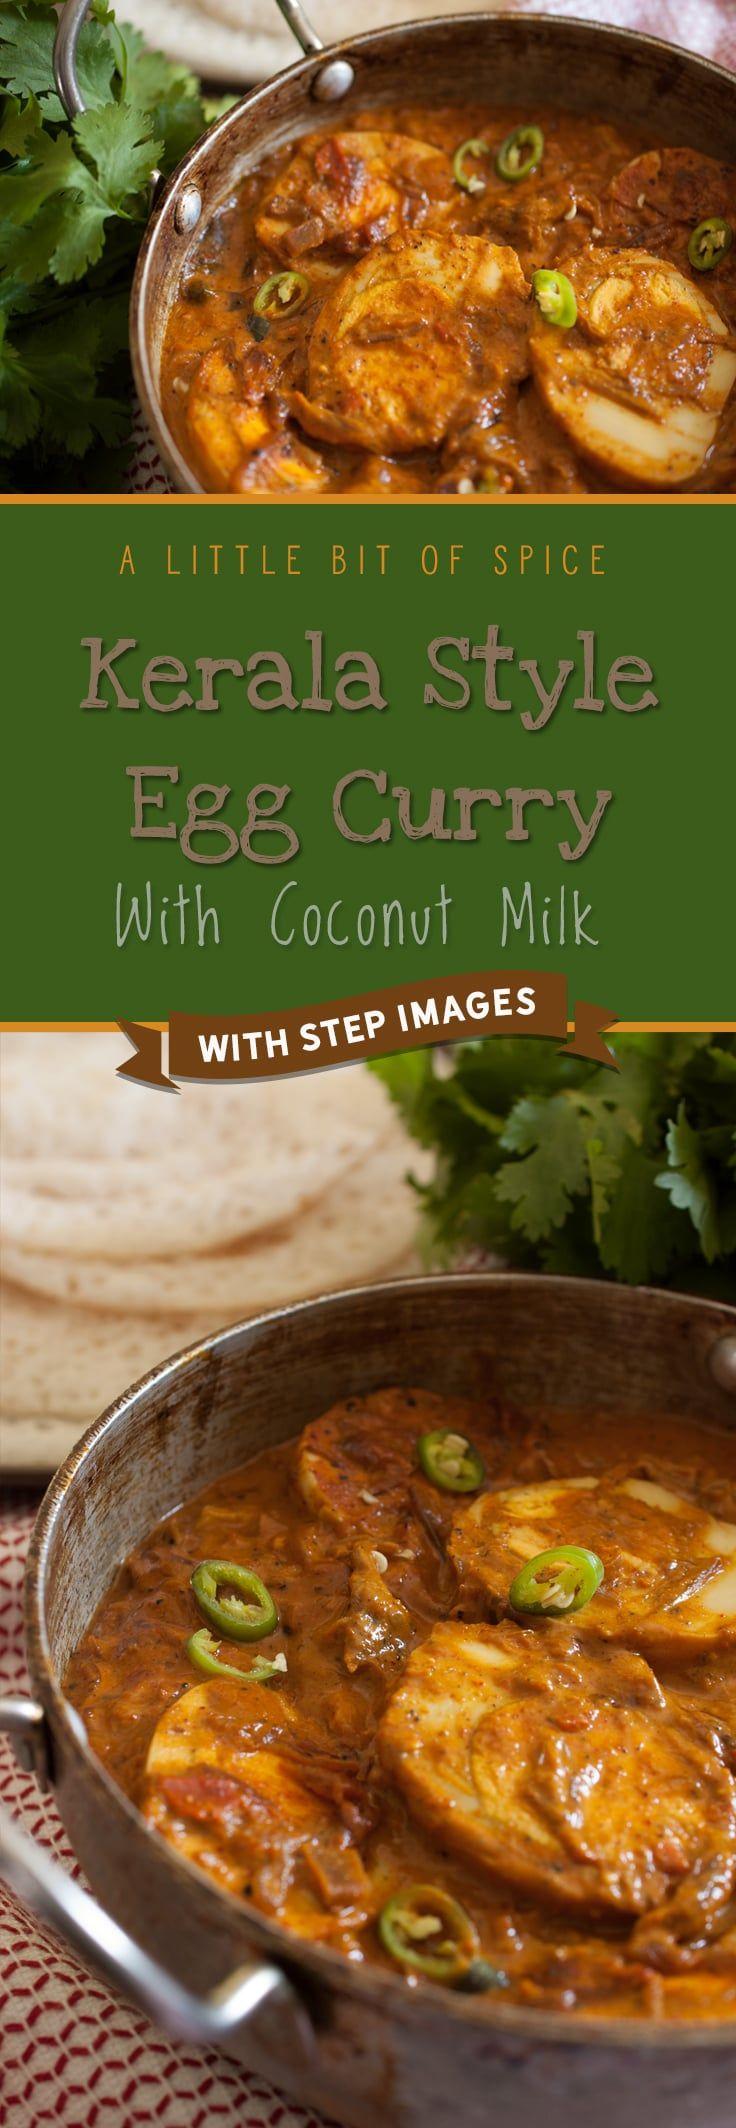 Kerala Egg Curry With Coconut Milk (Nadan Mutta Curry)